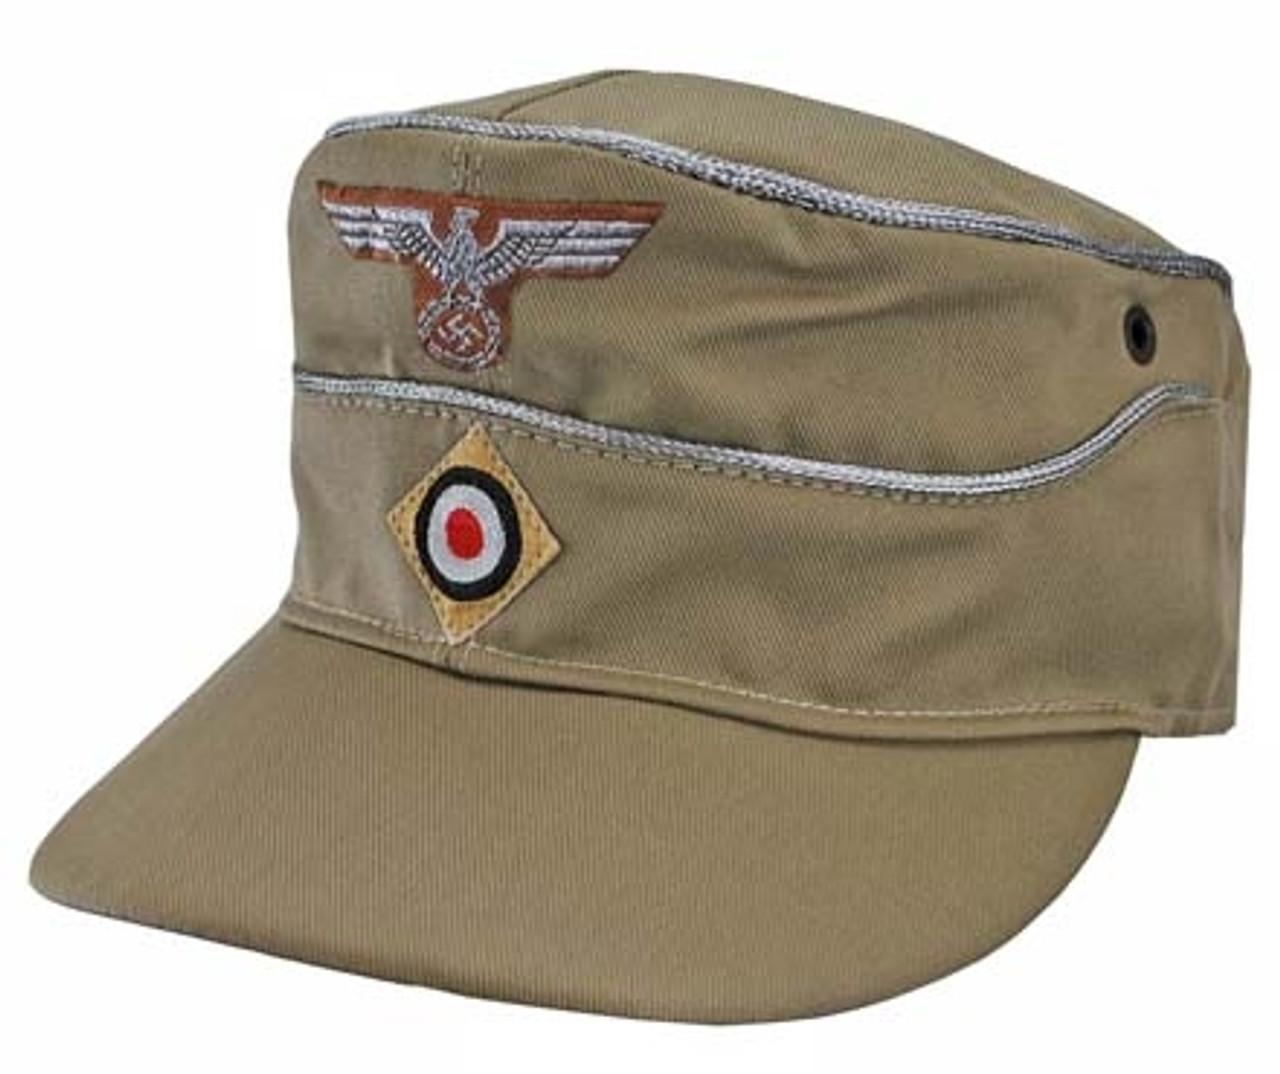 M41 Officer's Tropical Field Cap from Hessen Antique